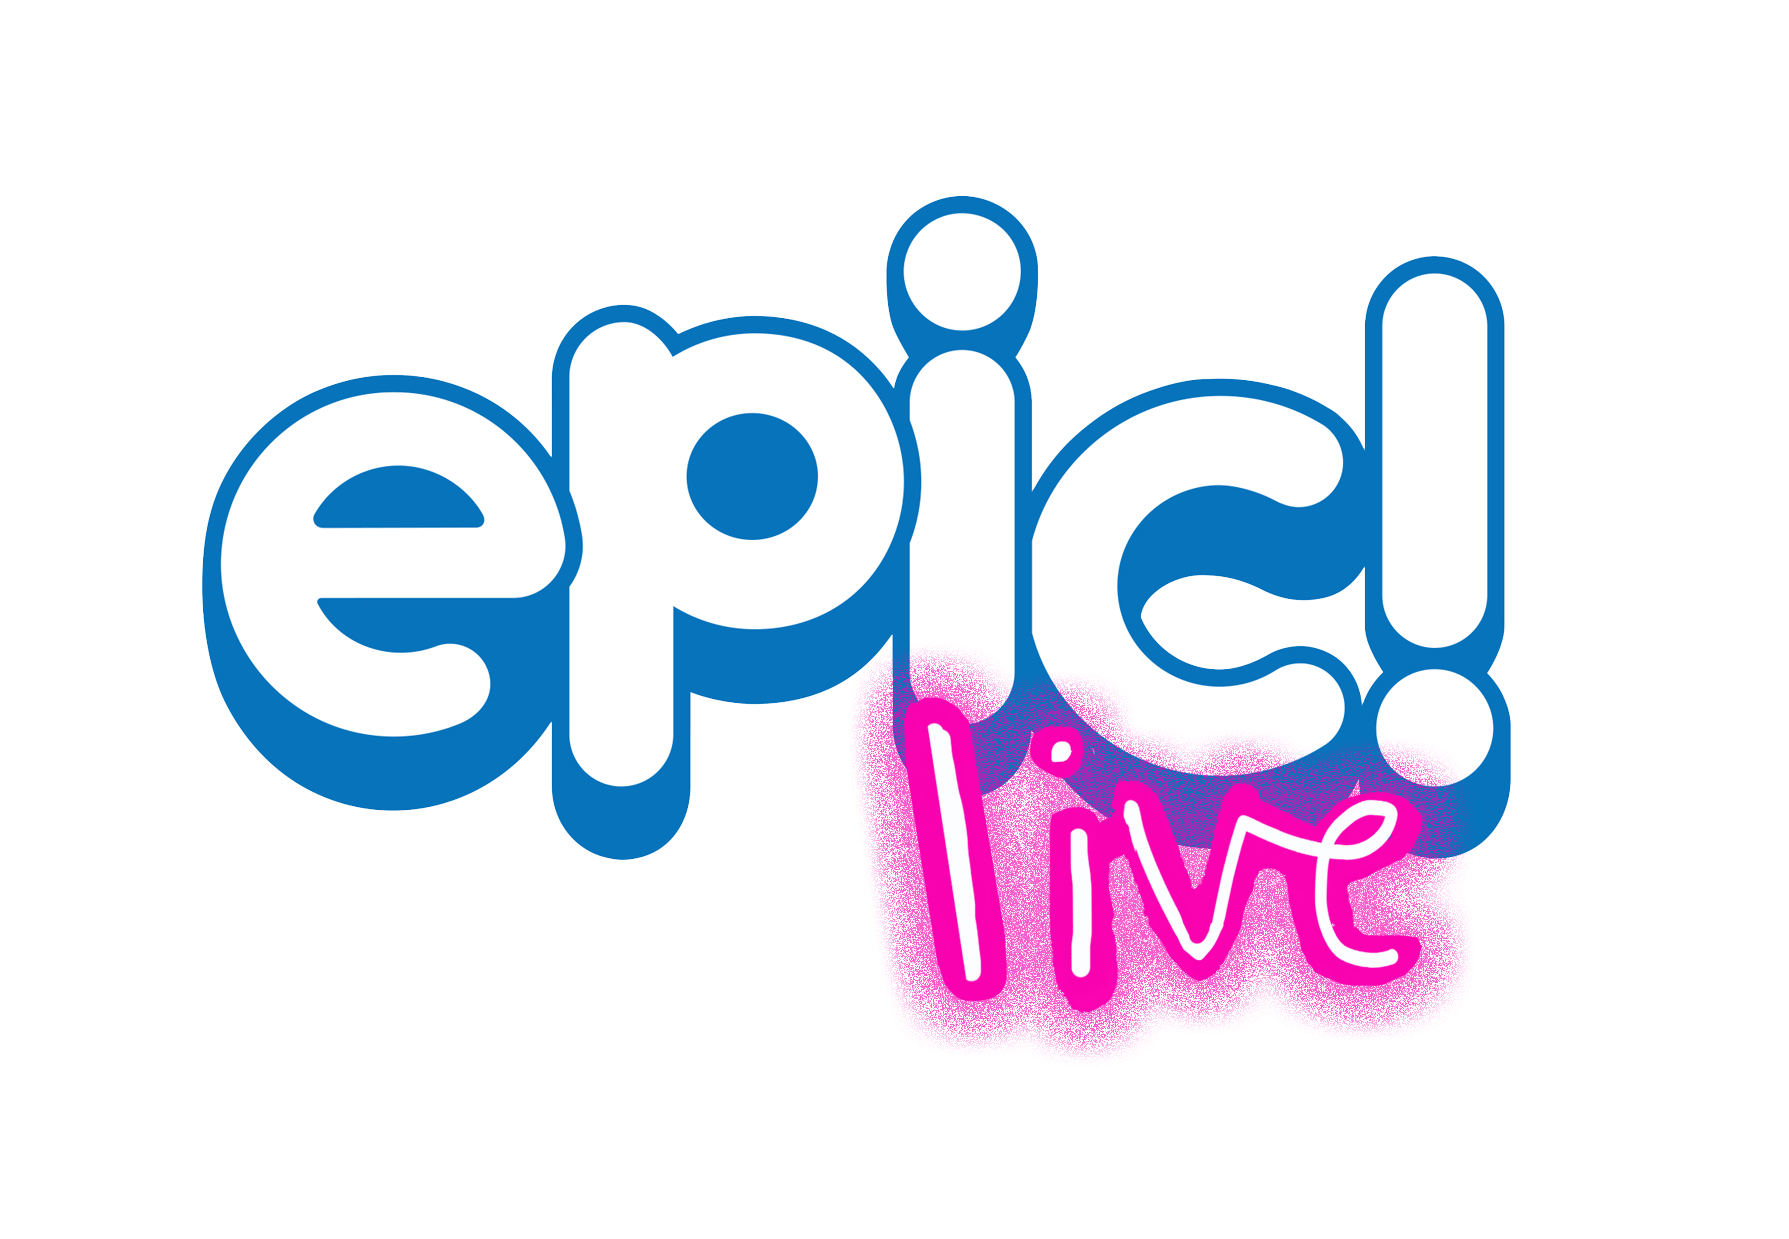 Introducing Epic Live Epic Blog